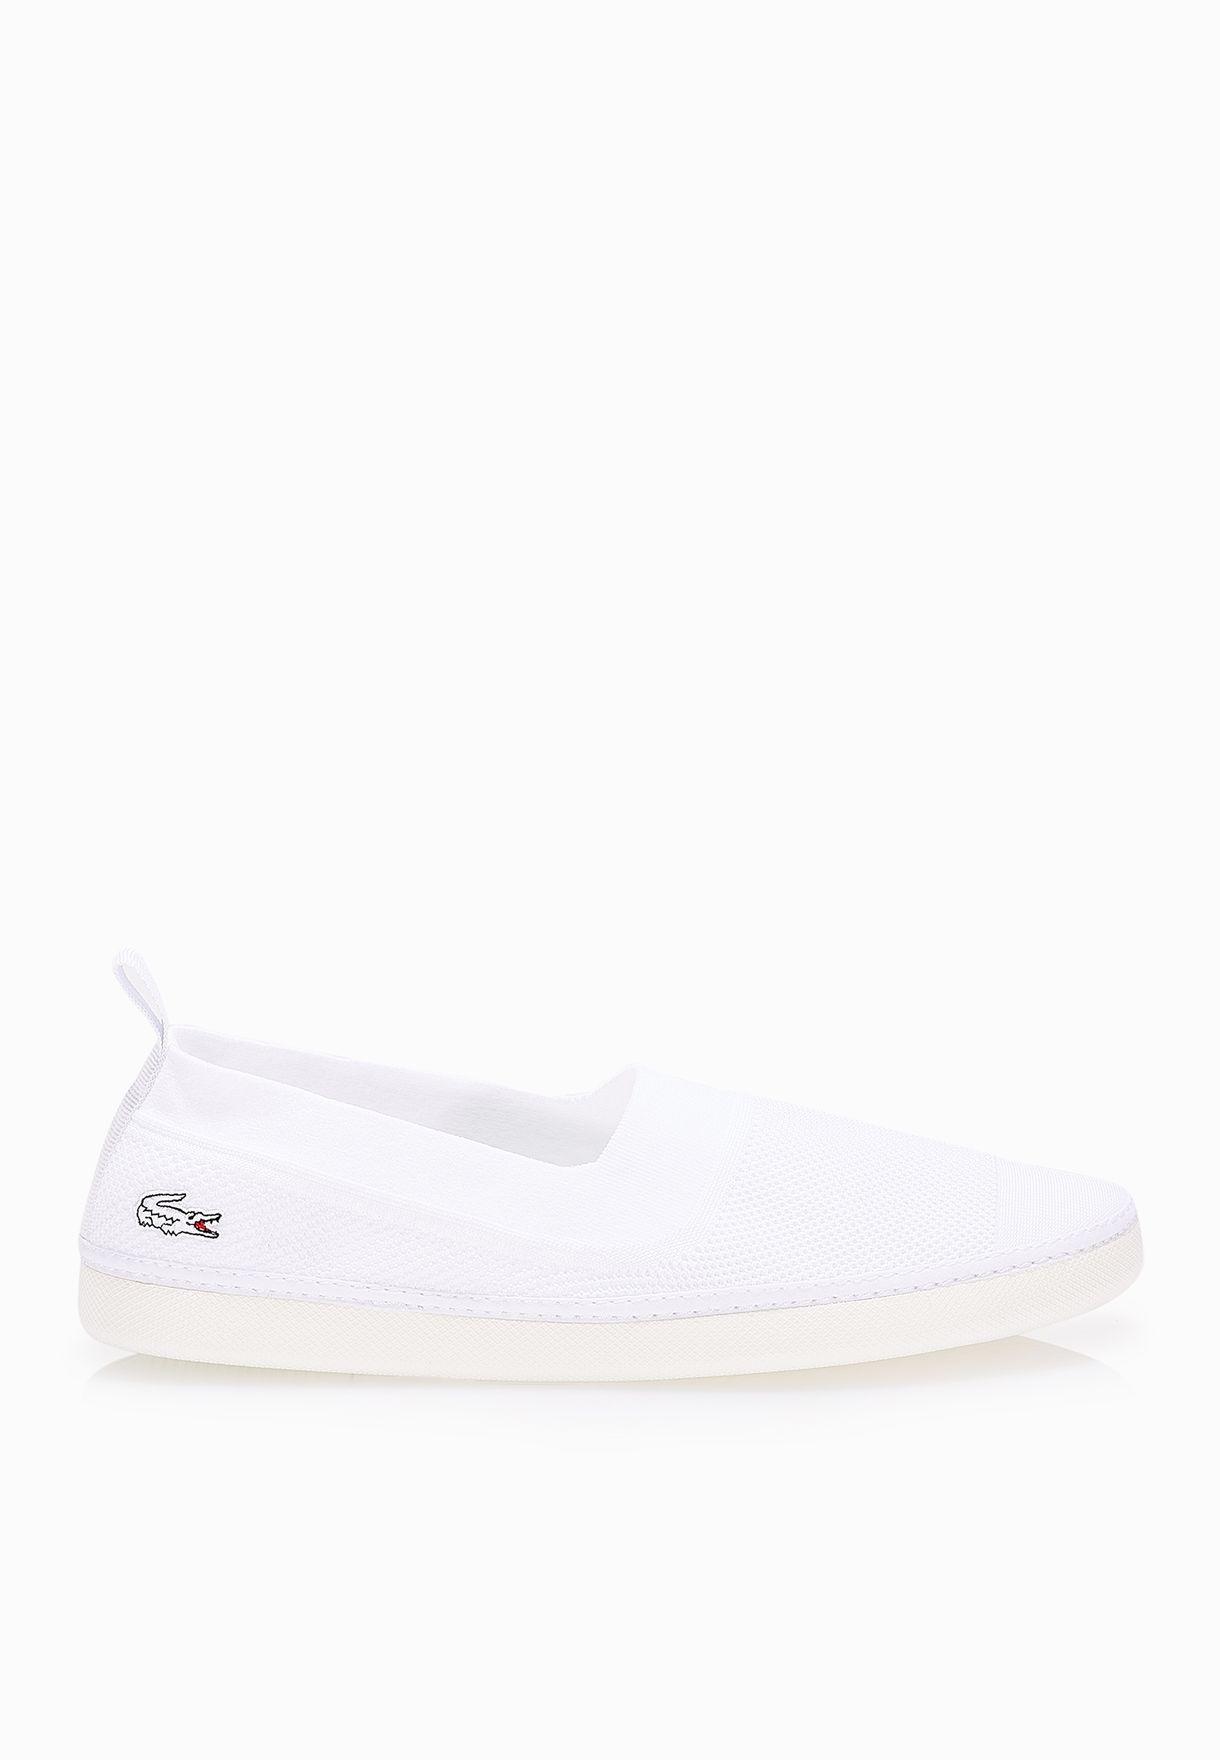 e0965e801 Shop Lacoste white L.Ydro 116 1 Slip ons 31SPM0092-001 for Men in ...